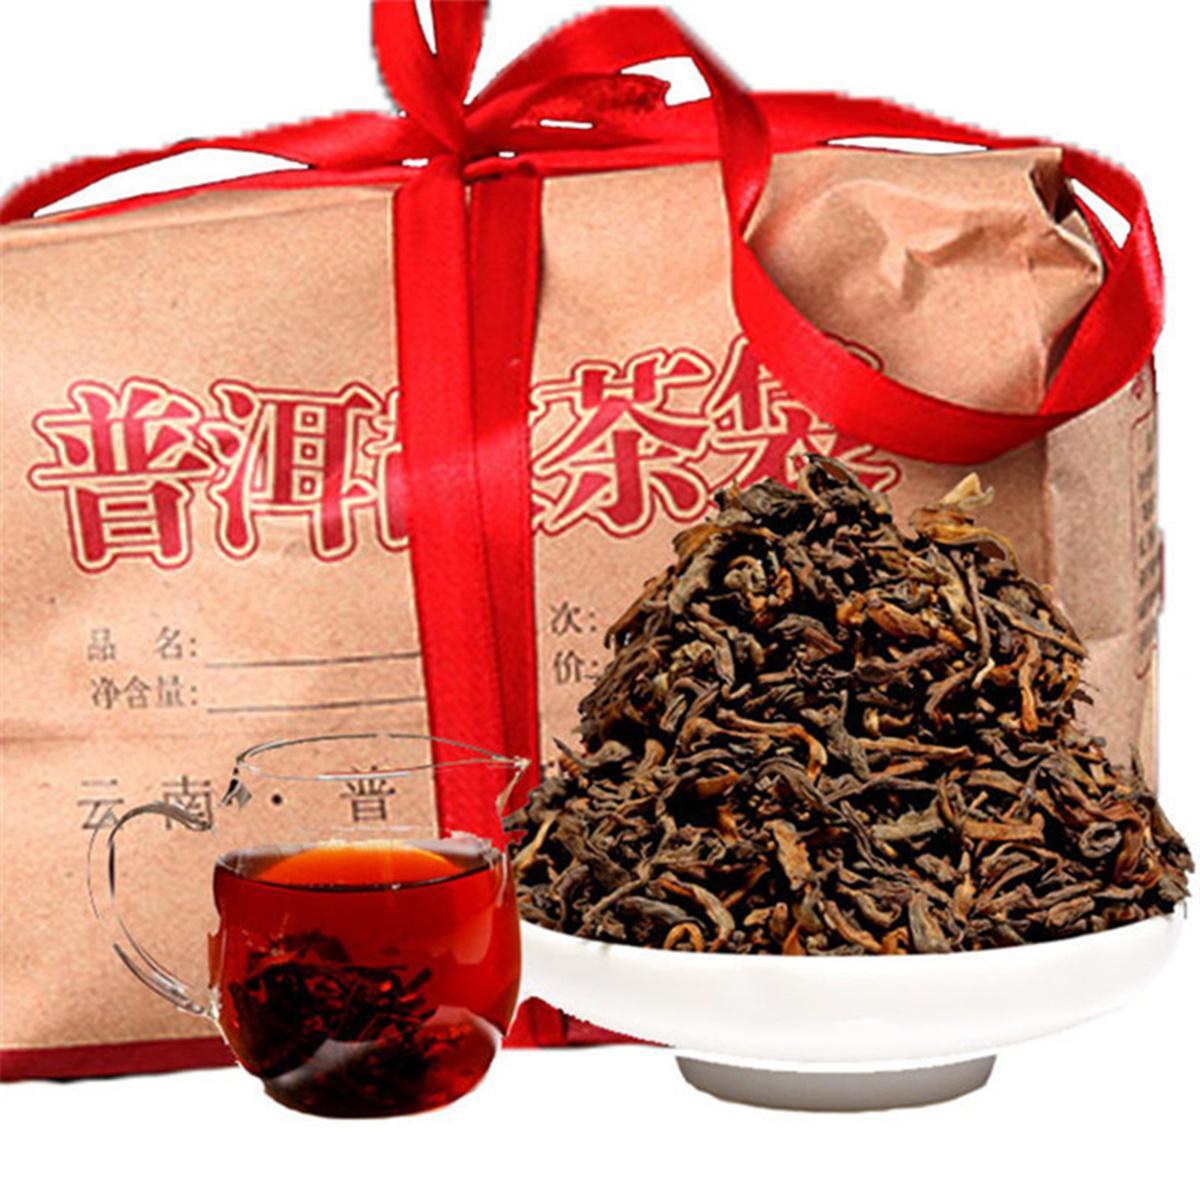 500g 운남 녹색 식품 포장 Puer 블랙 Puerh 선물 요리 느슨한 잘 익은 Puer 차 유기 자연 Puer 오래된 나무 특집